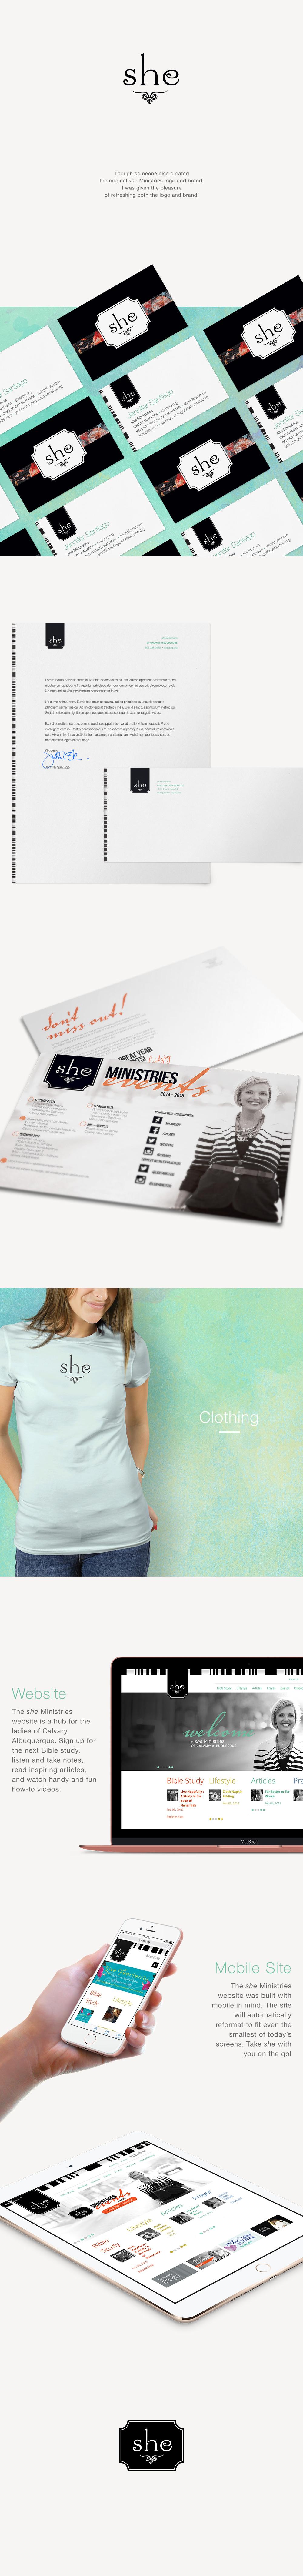 she Ministries Brand Refresh